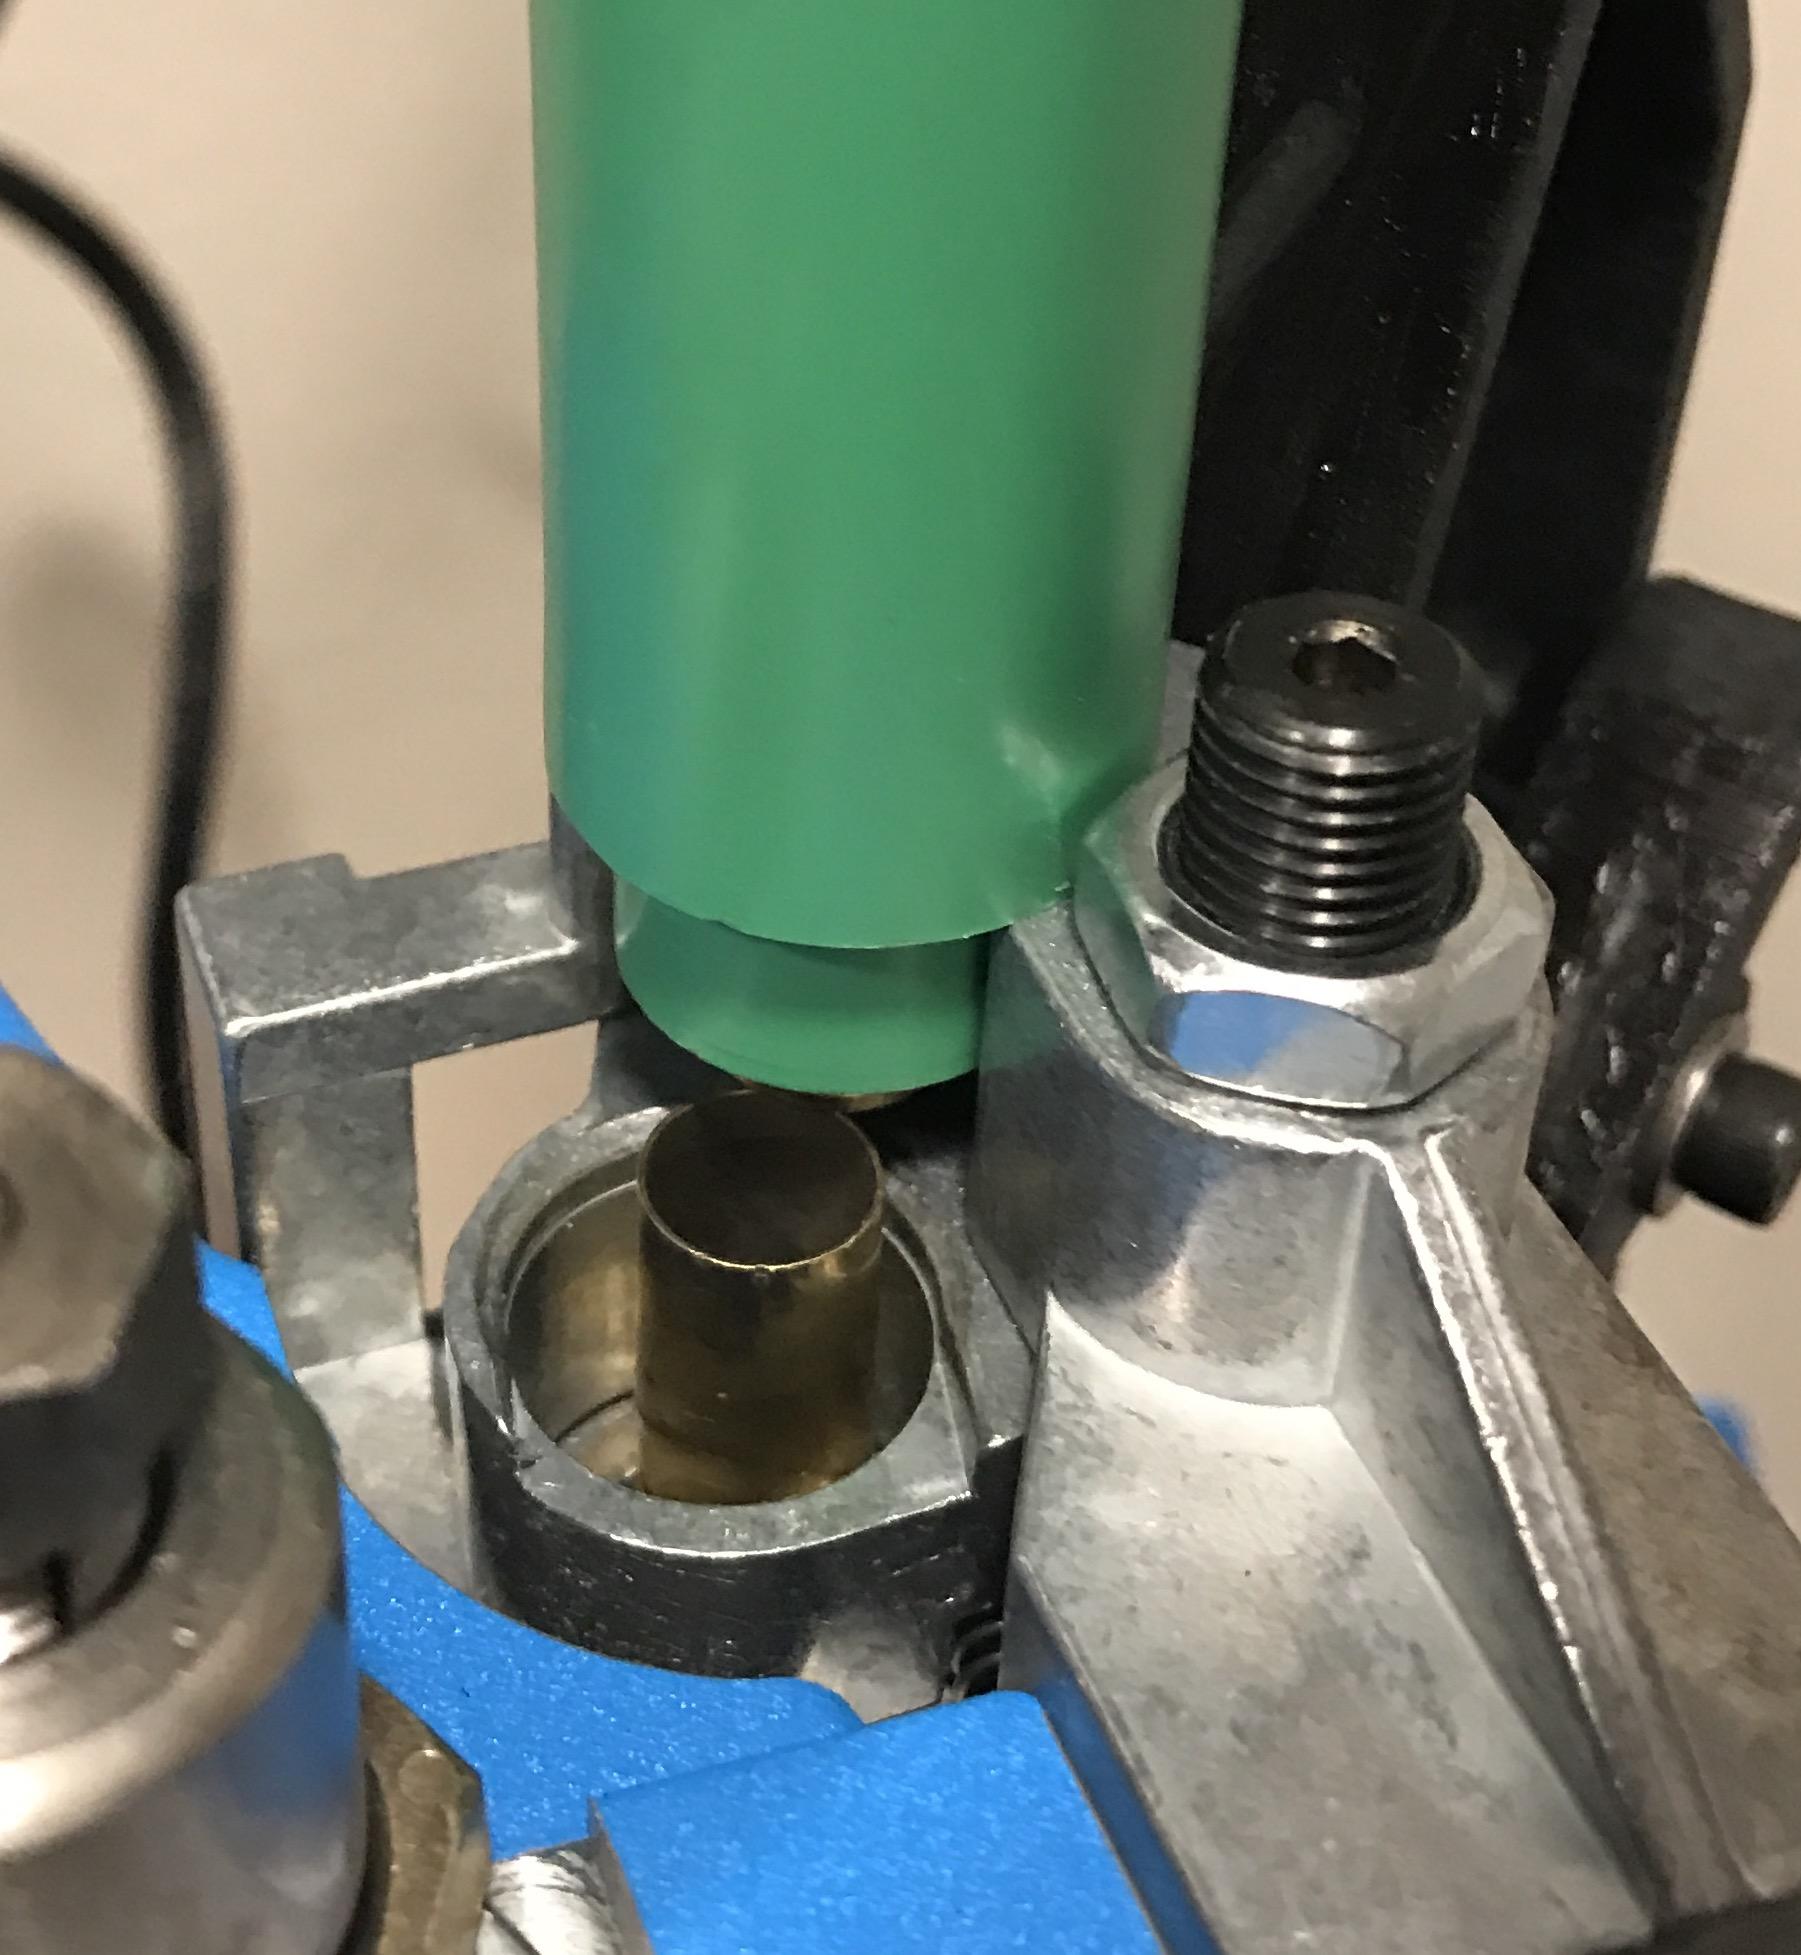 650 case feeding help - Dillon Precision Reloading Equipment